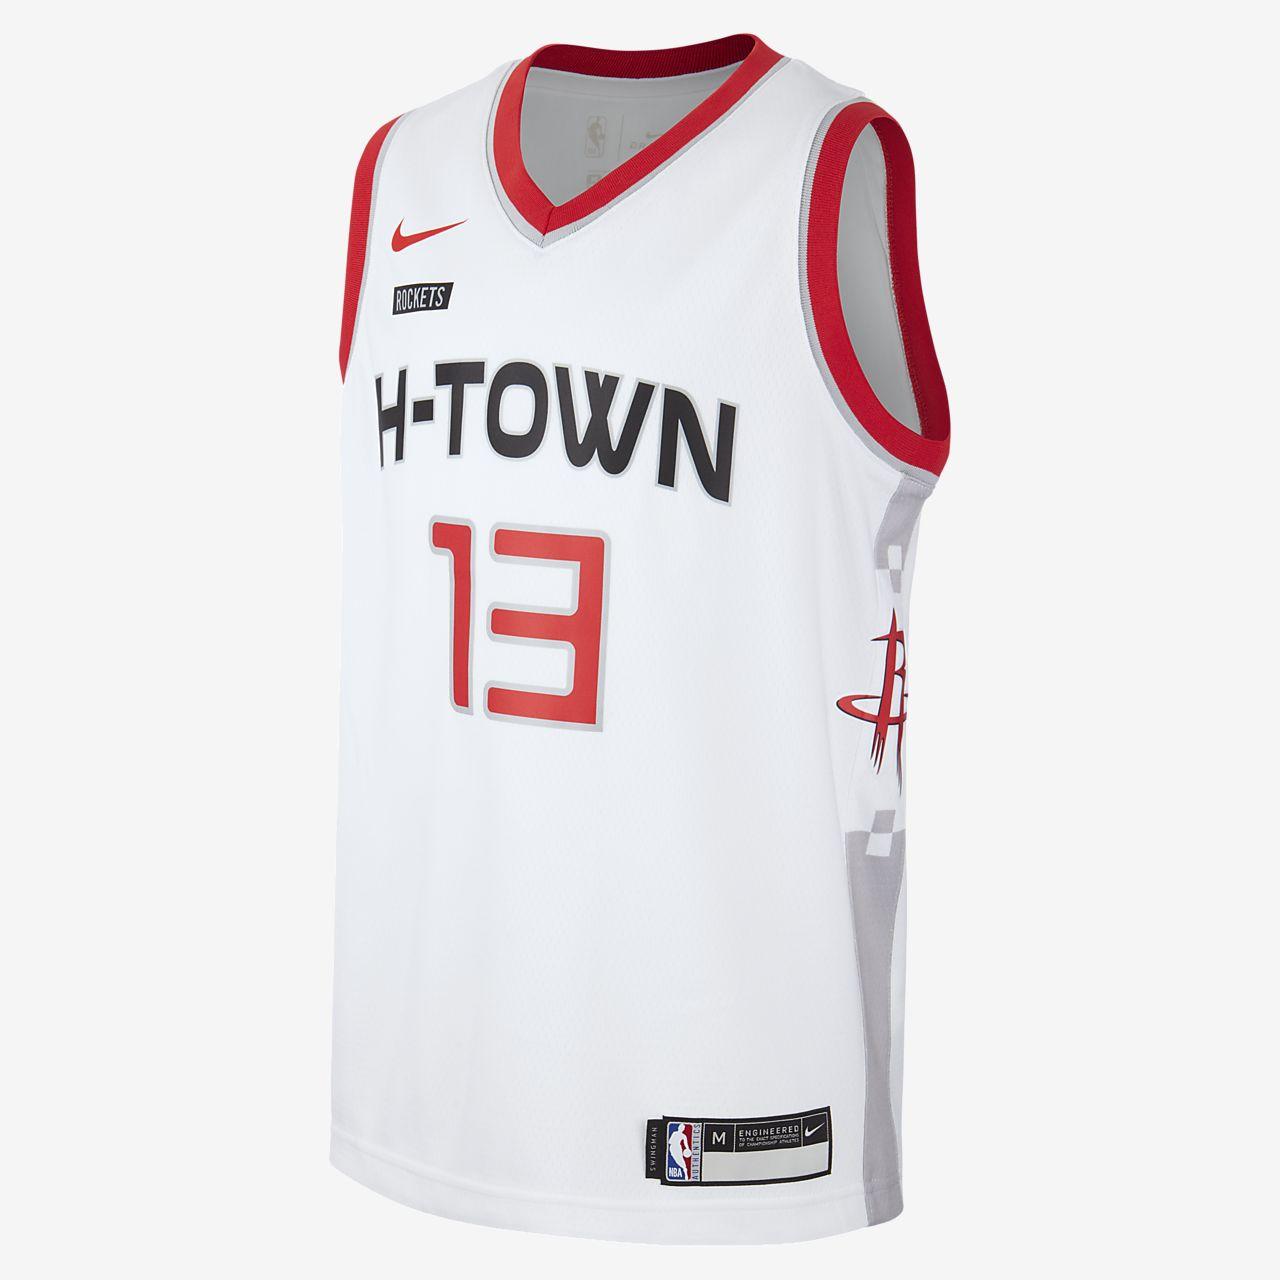 Rockets City Edition Nike NBA Swingman trøje til store børn